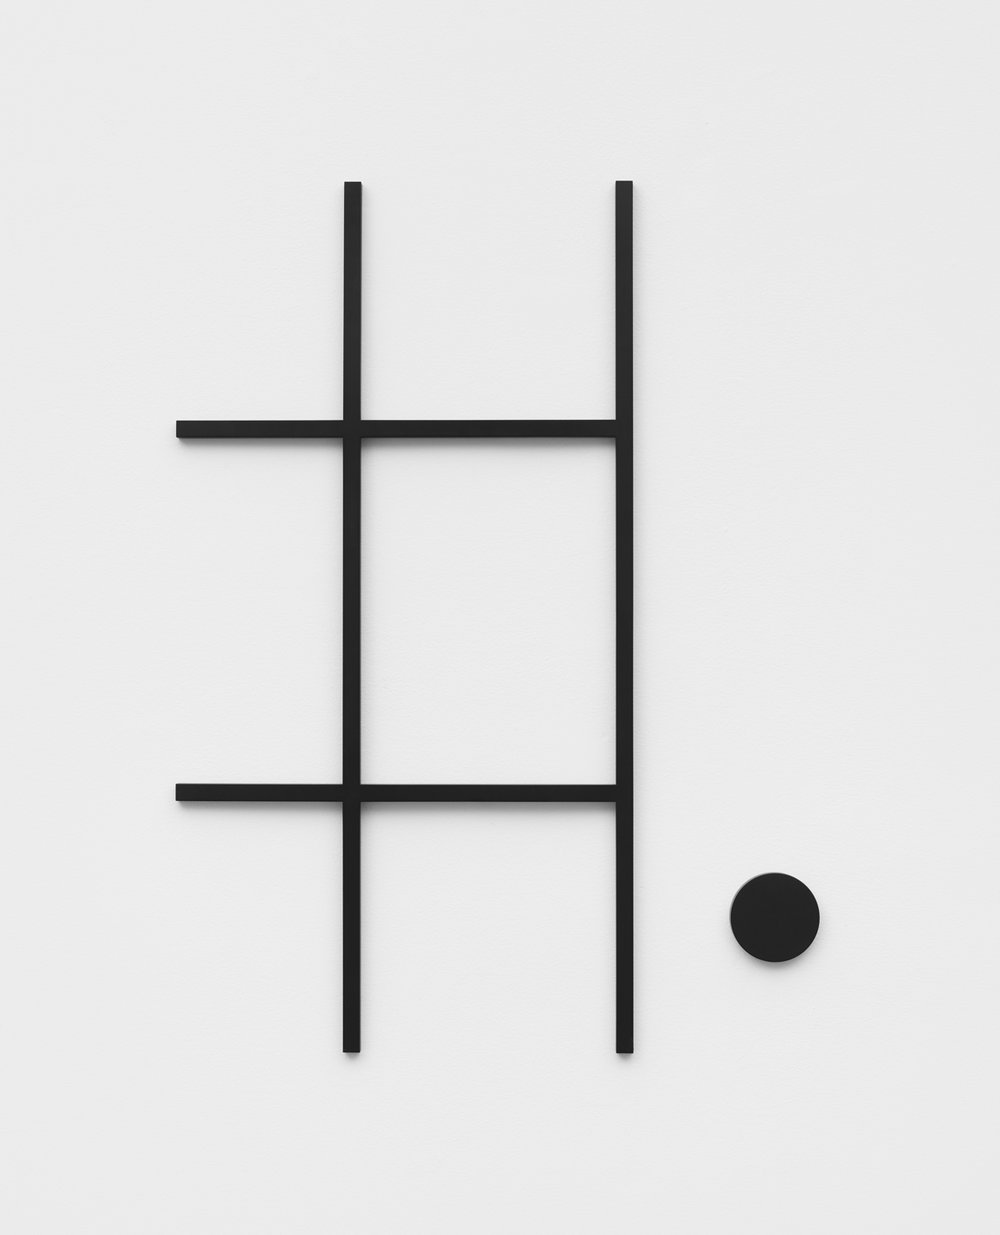 Philippe Decrauzat   Fragment after a sketch , 2018  steel, paint  73,4 x 98,2 cm - 28  x 38 5/8 in